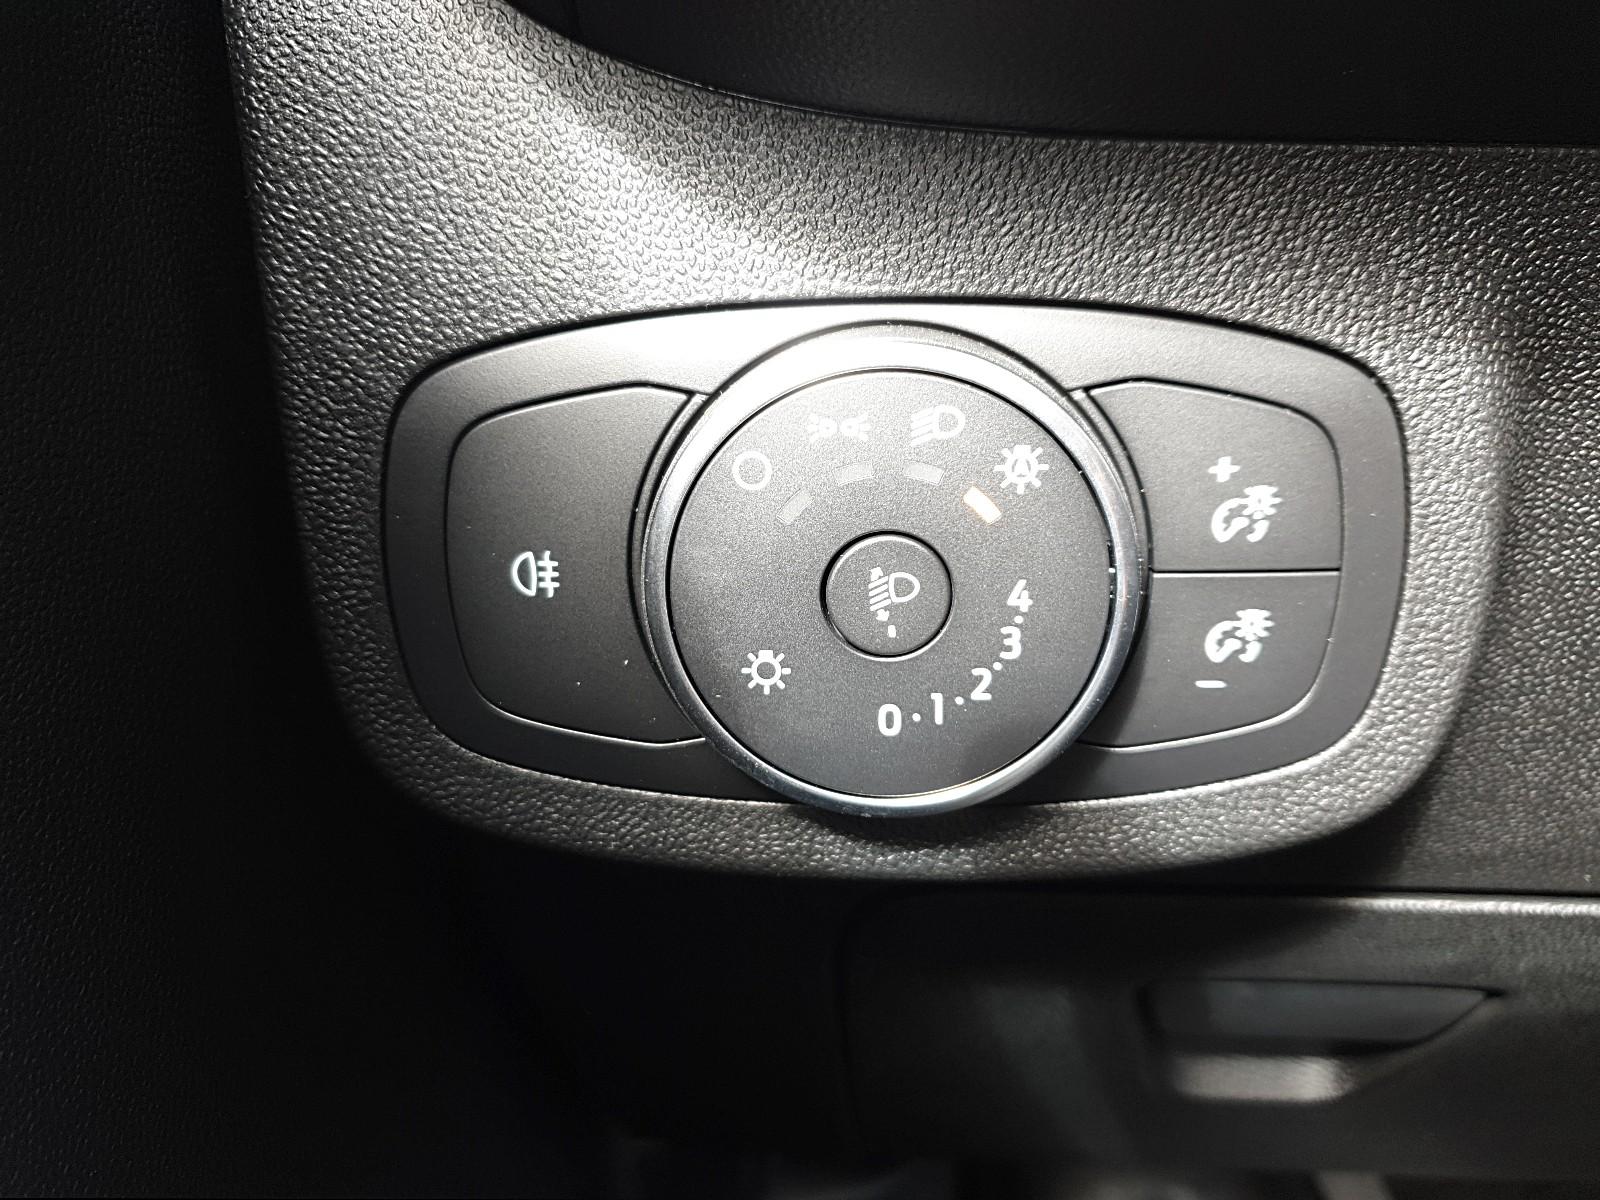 FORD FIESTA 1.1 85PS Trend 5-Türig Klima Navi Bluetooth PDC DAB+ Touch-Bilds Viscaal Fahrzeuggrosshandel GmbH, D-49847 Itterbeck